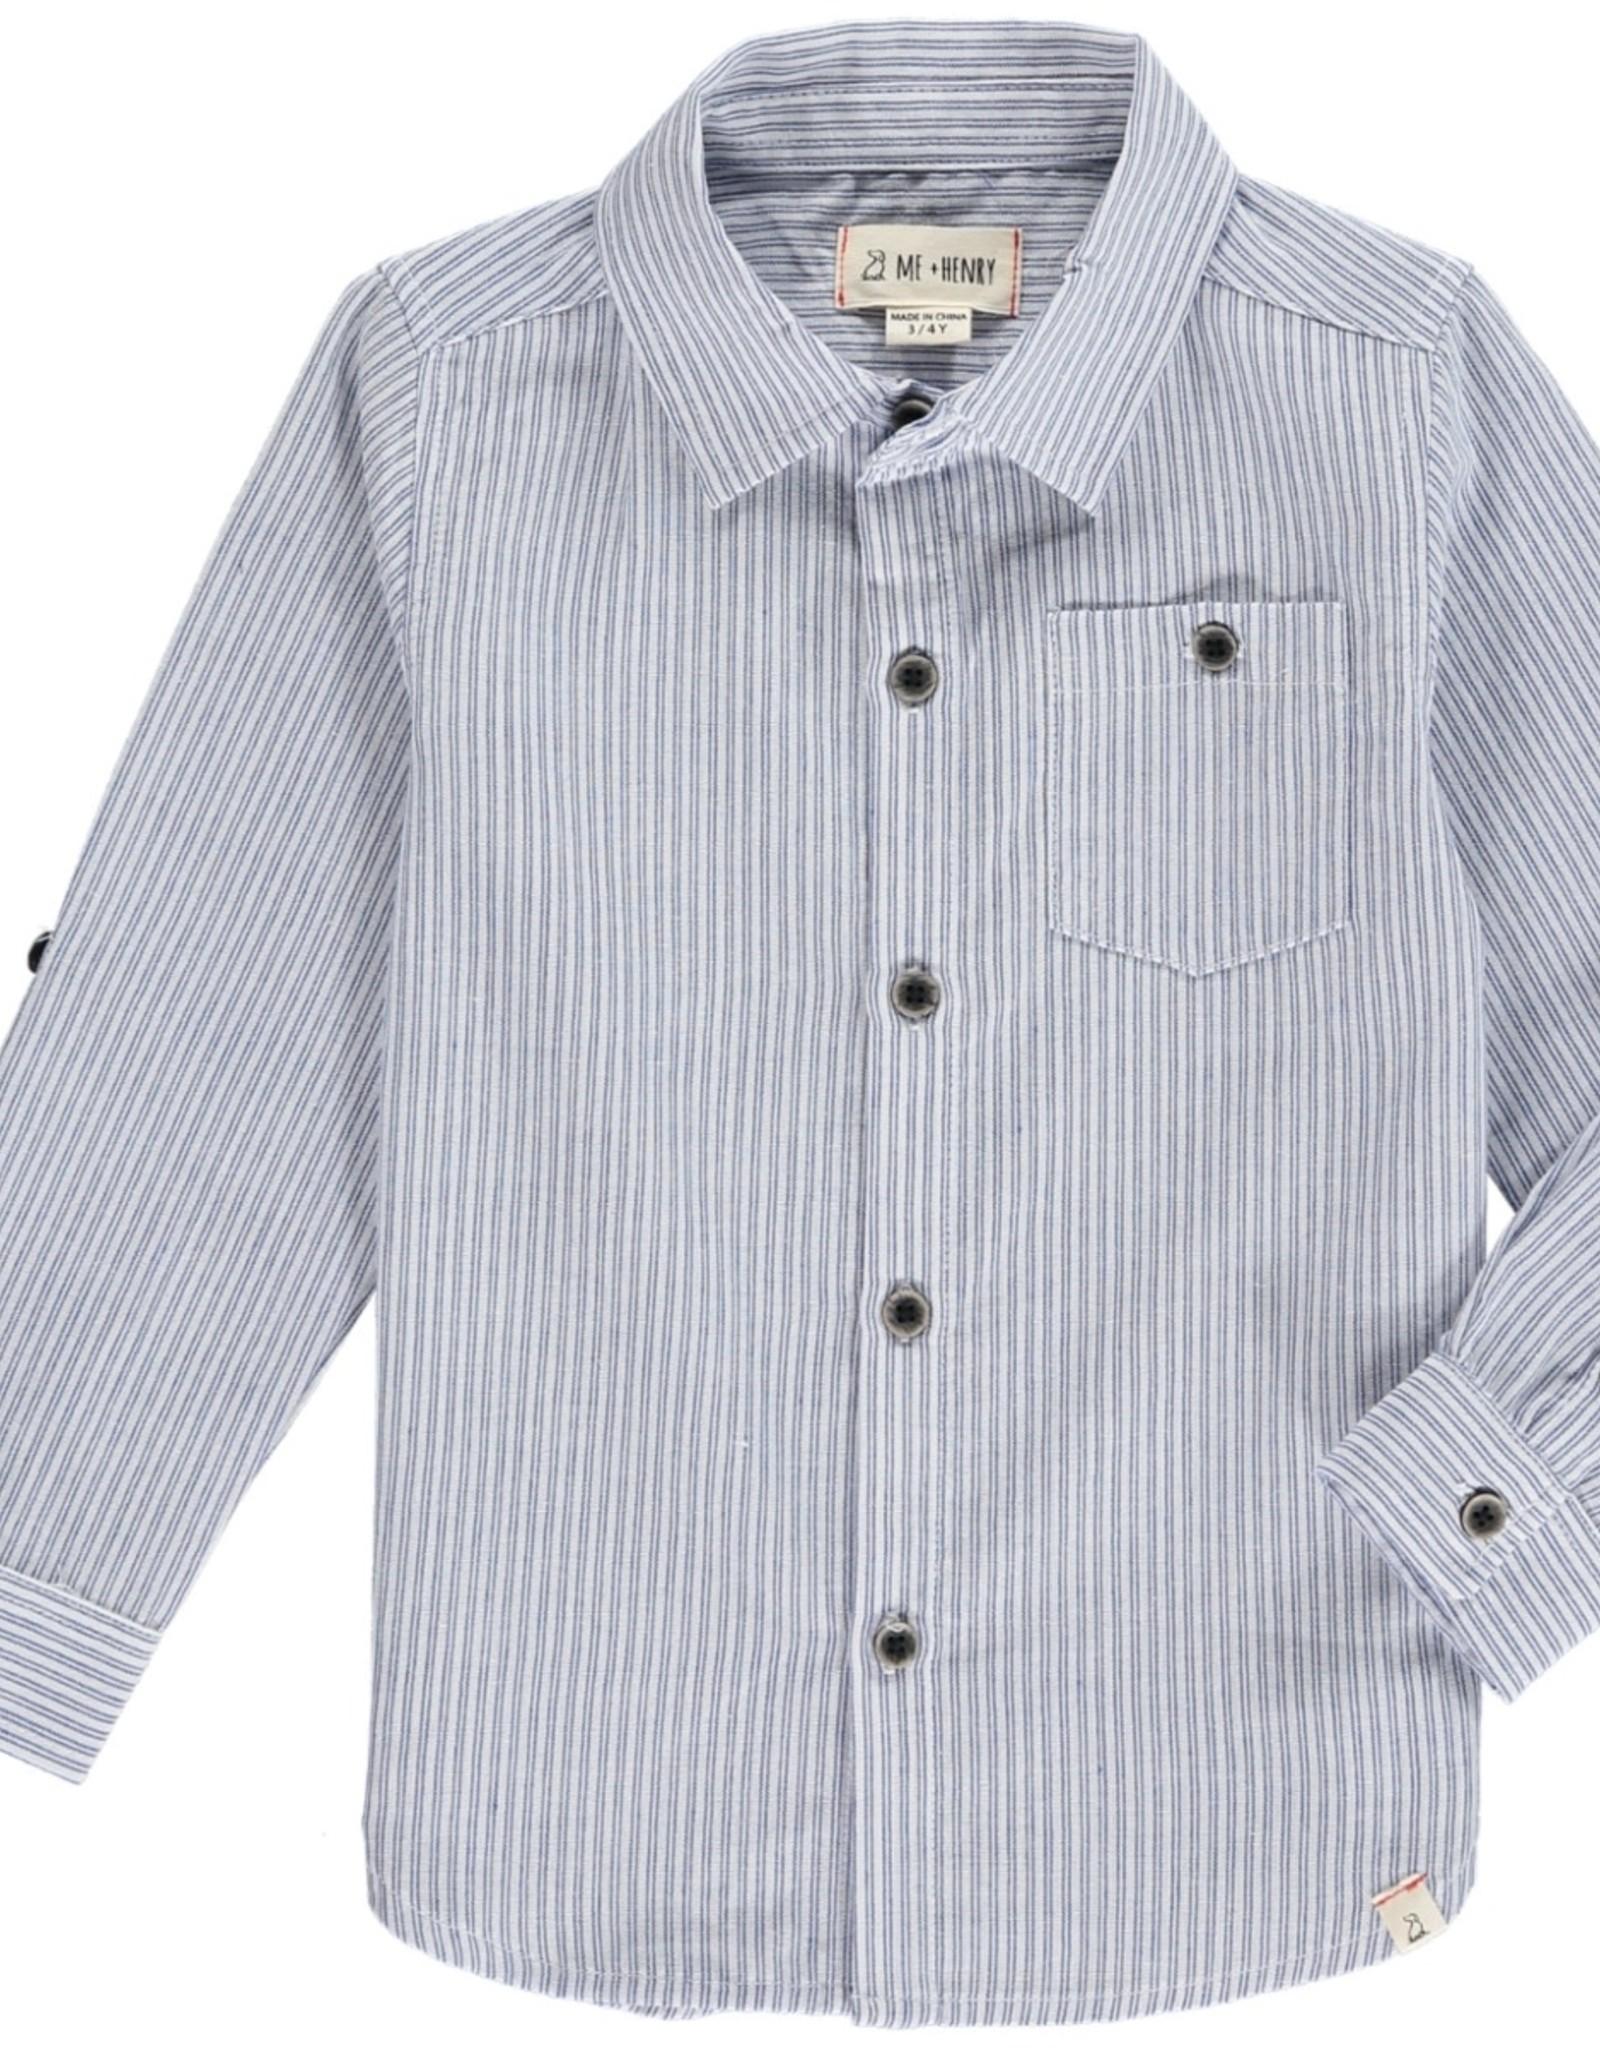 Blue/White stripe shirt